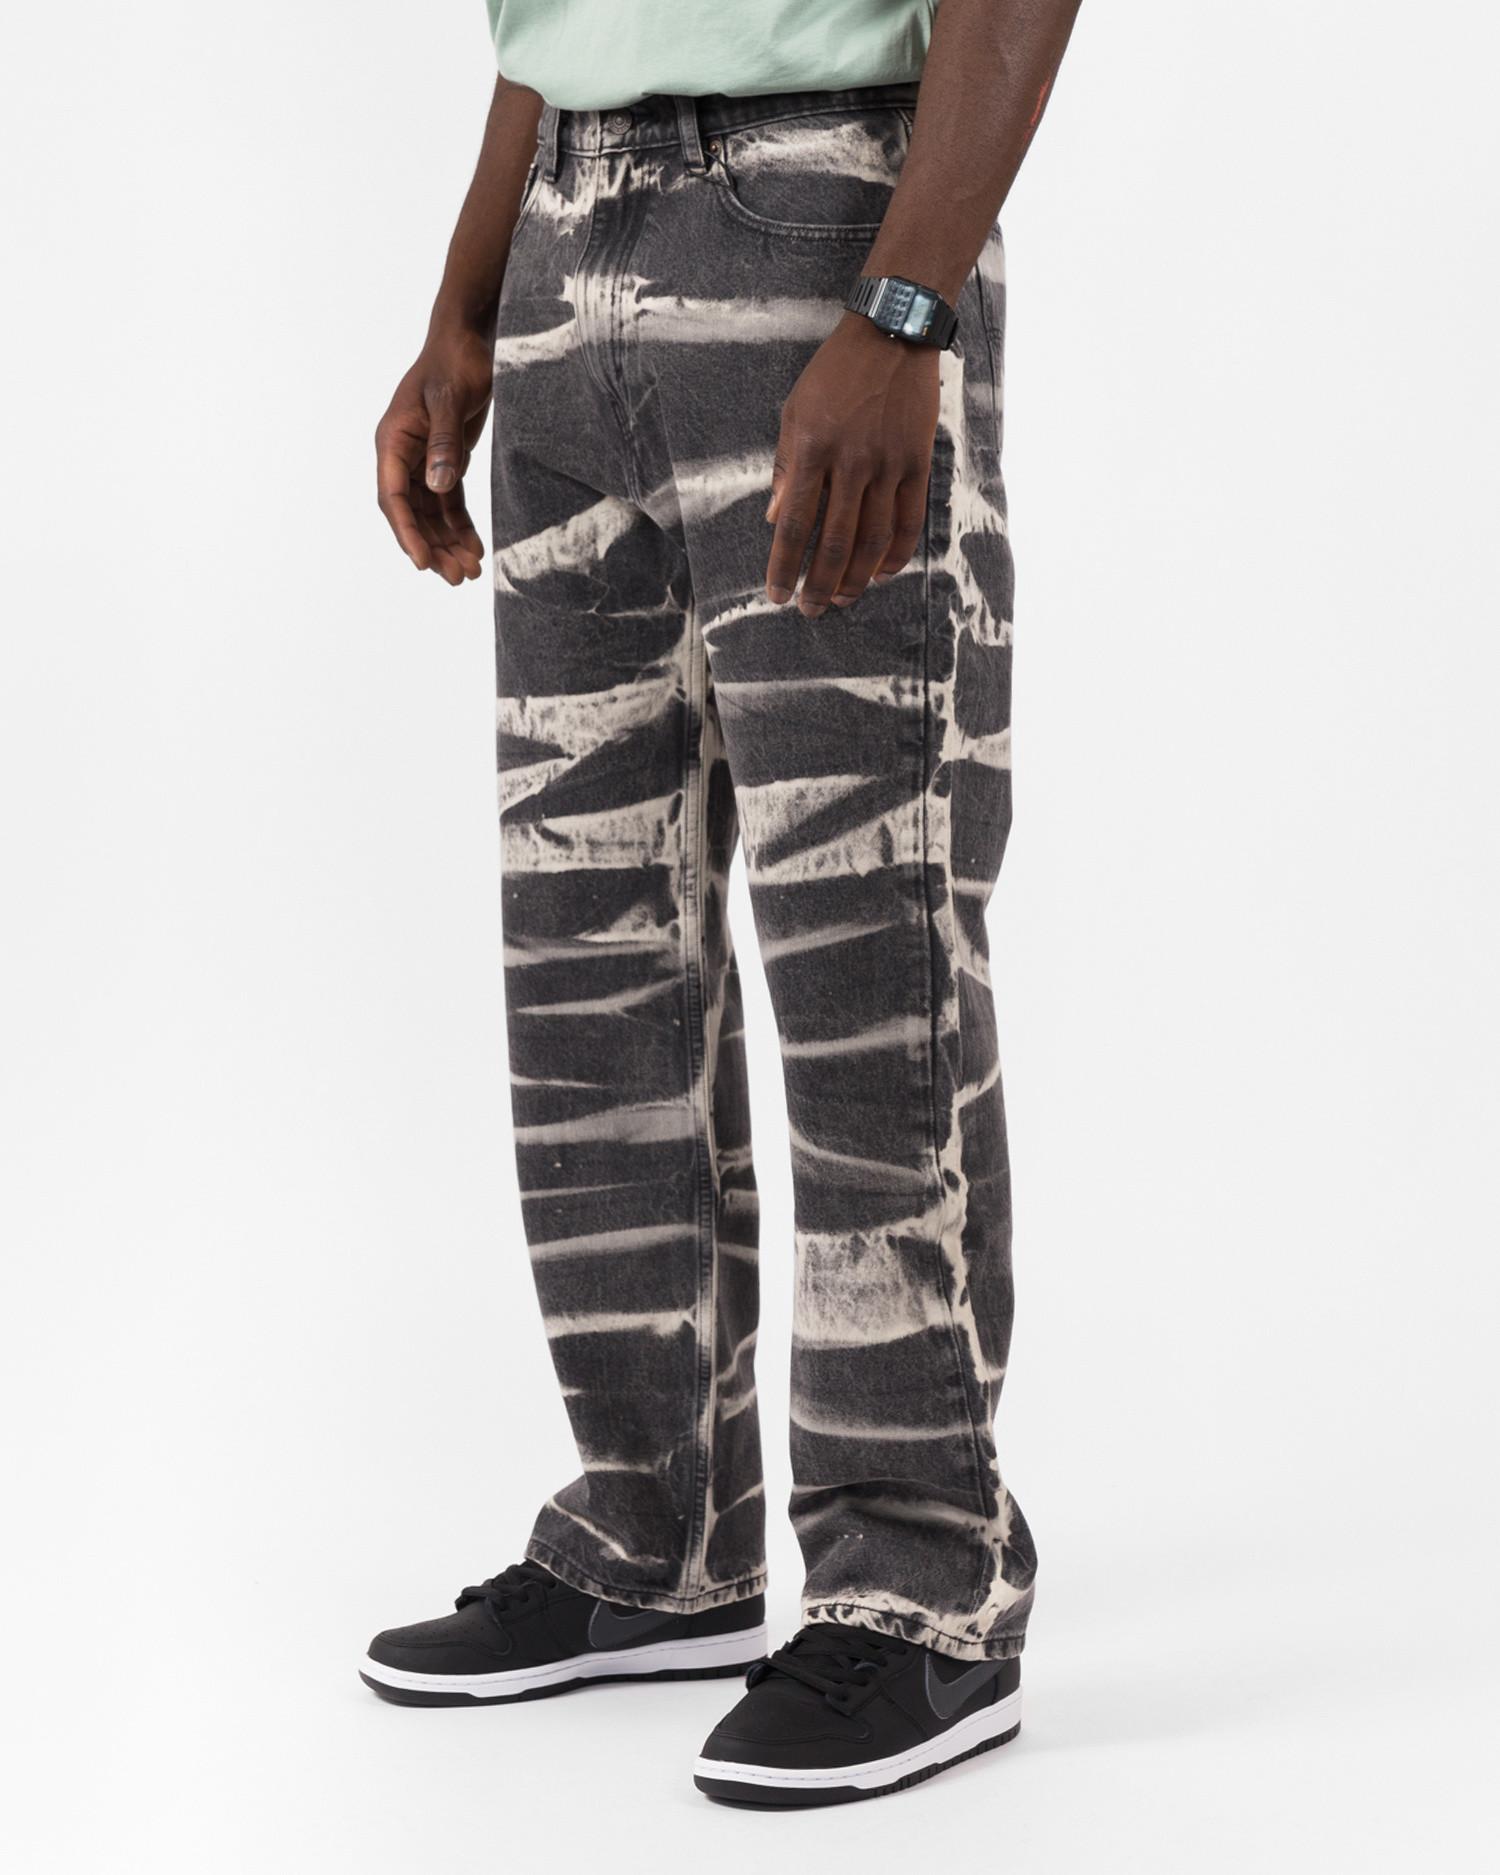 Levi's Skate Baggy 5 Pocket S&E Black Snow